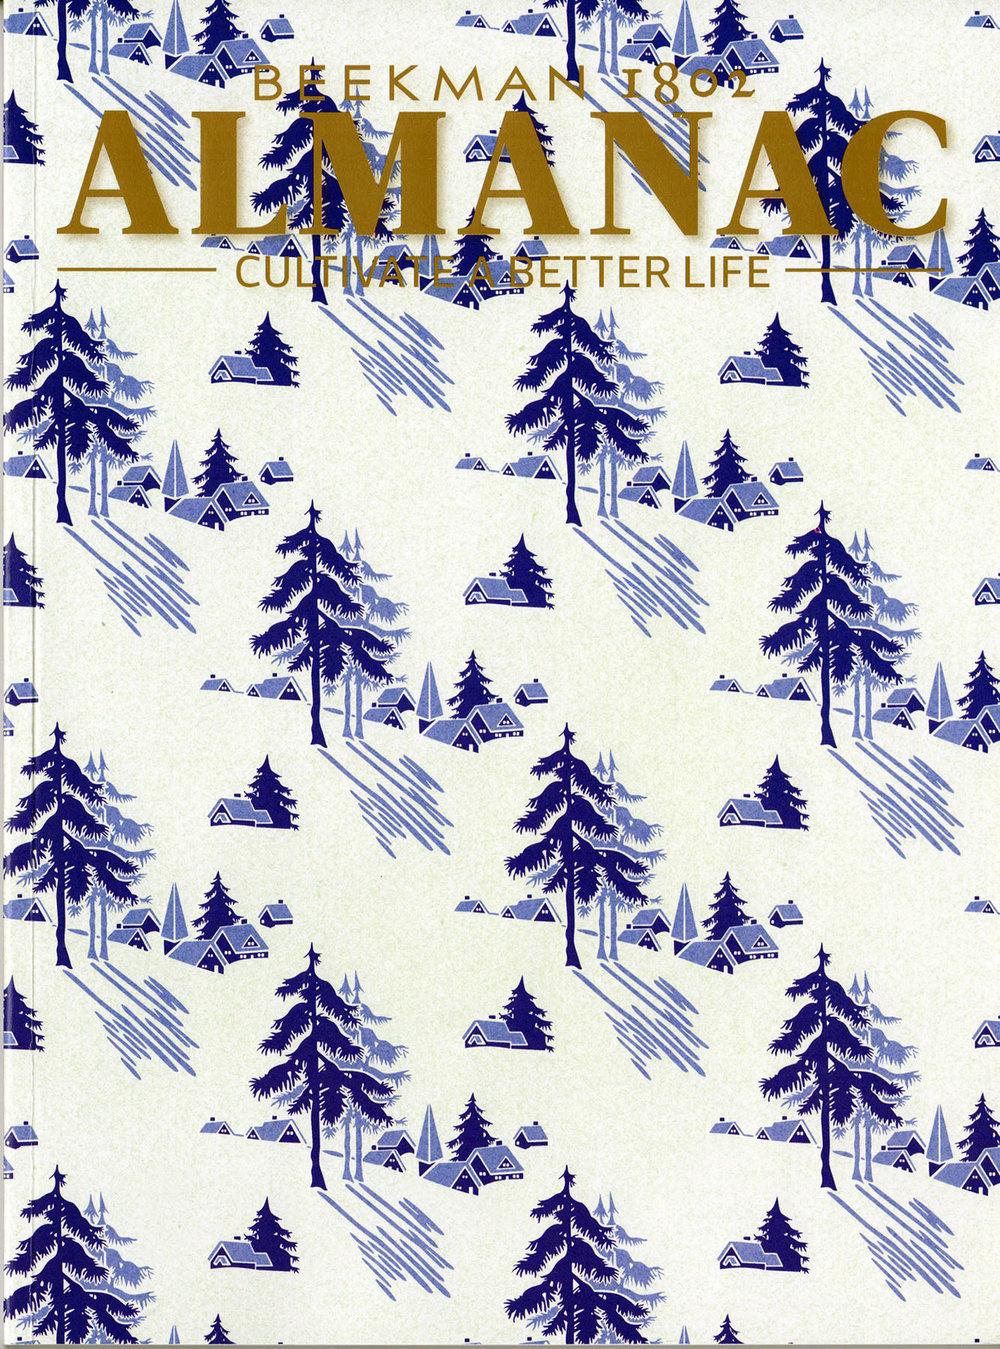 Beekman 1802 Almanac